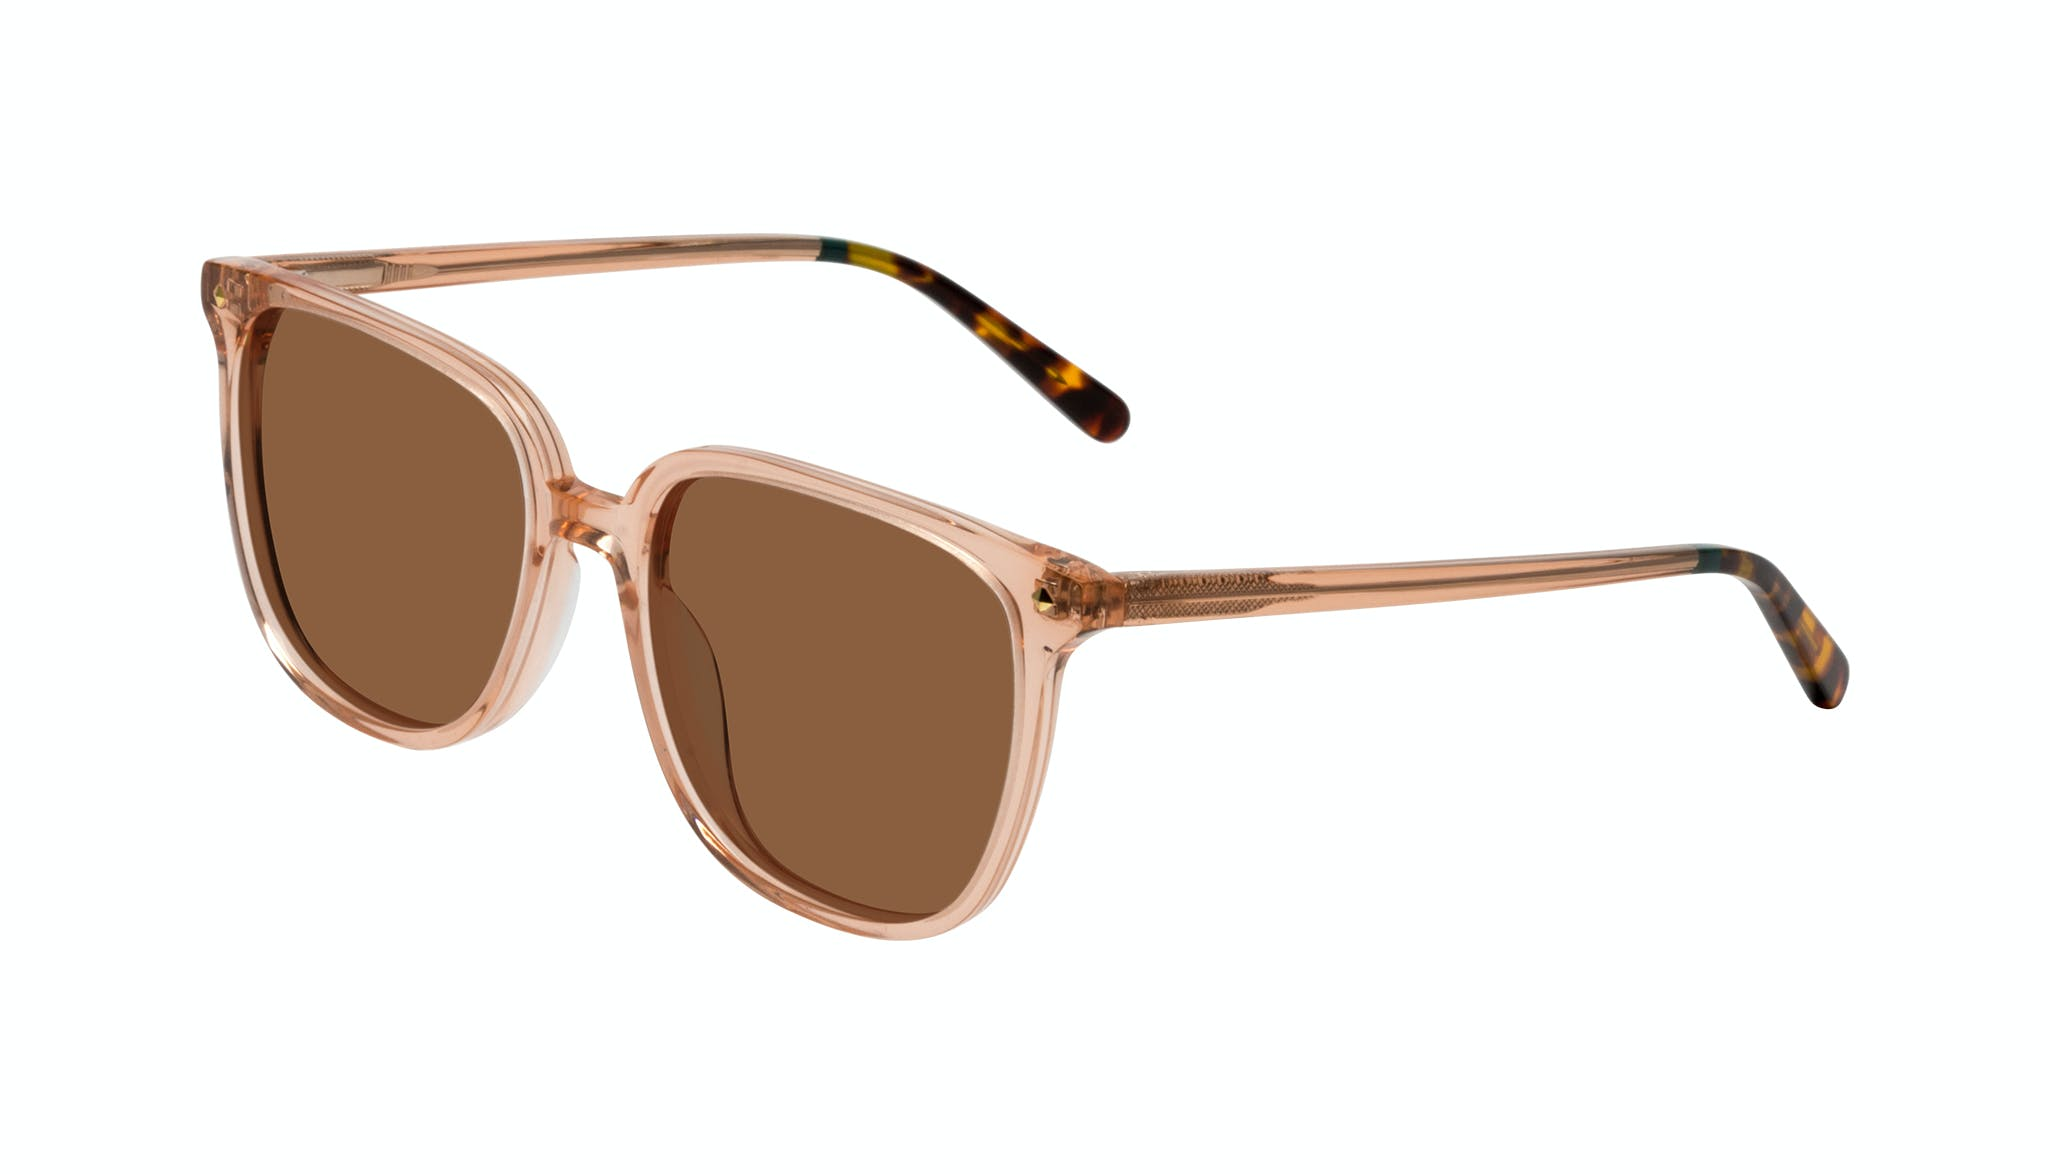 Affordable Fashion Glasses Cat Eye Sunglasses Women Gia Peach Tilt